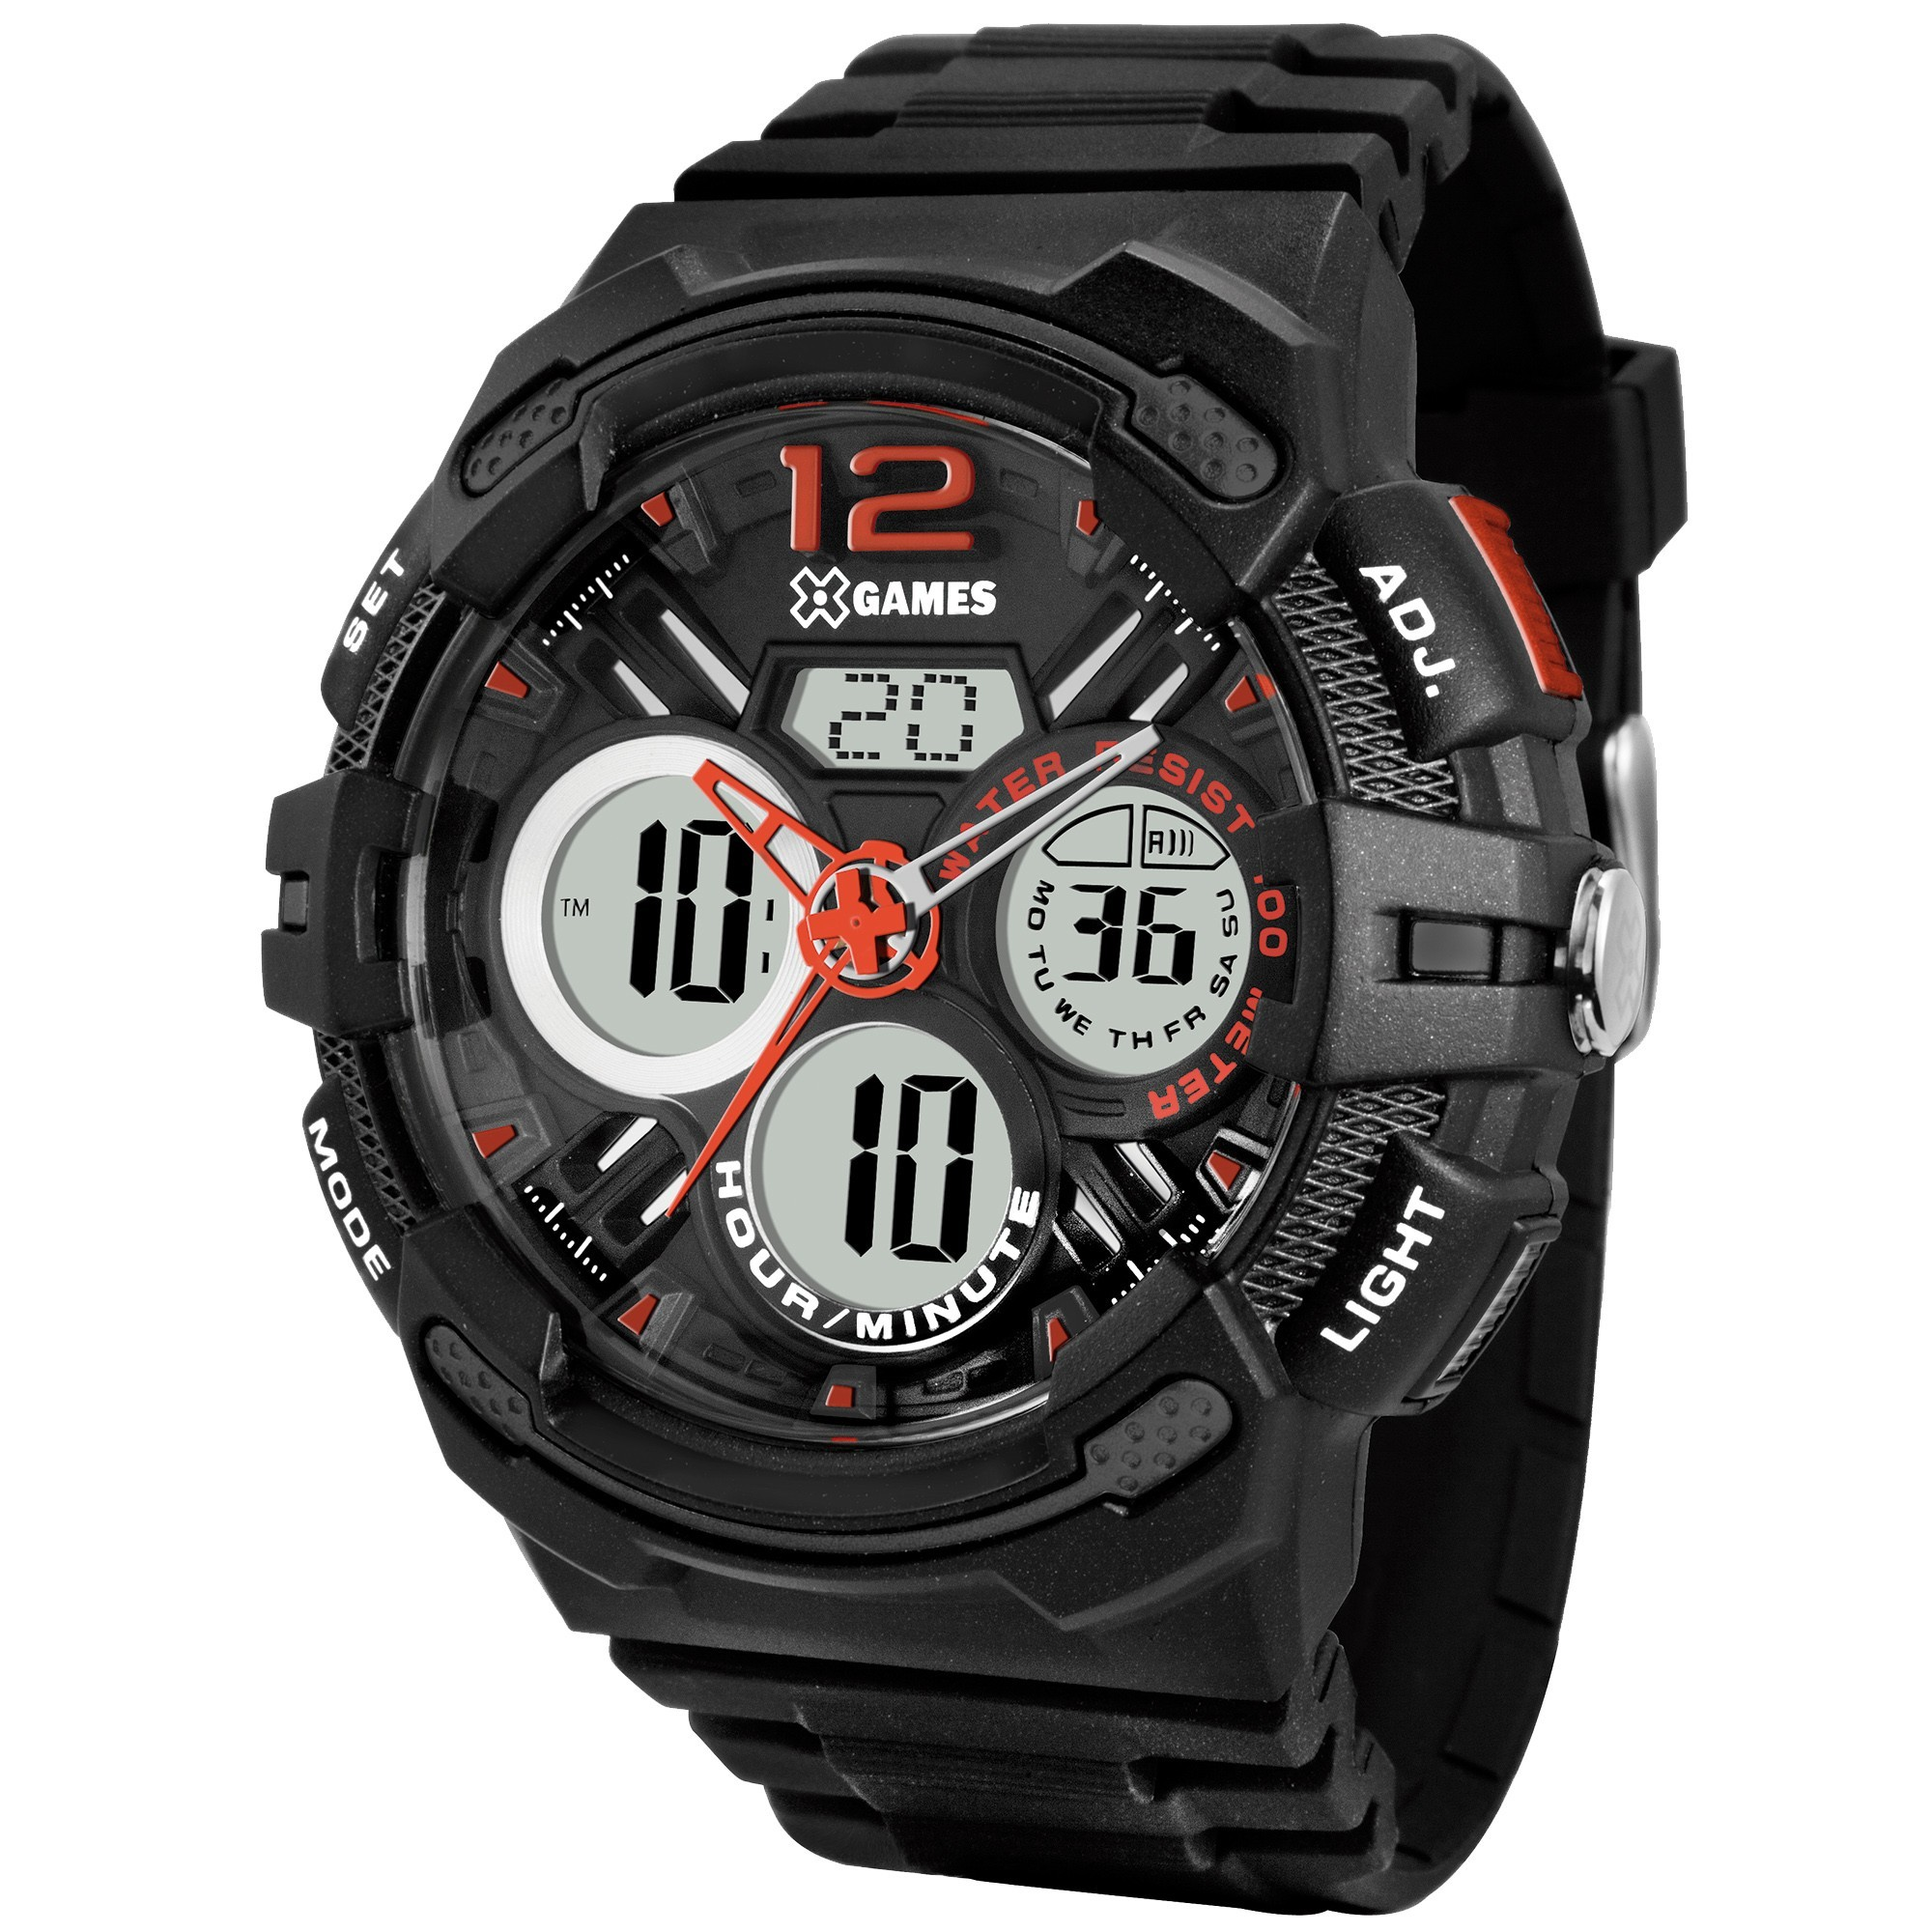 Relógio XGAMES XMPPA124 P2PX ANADIGI - Preto/Laranja